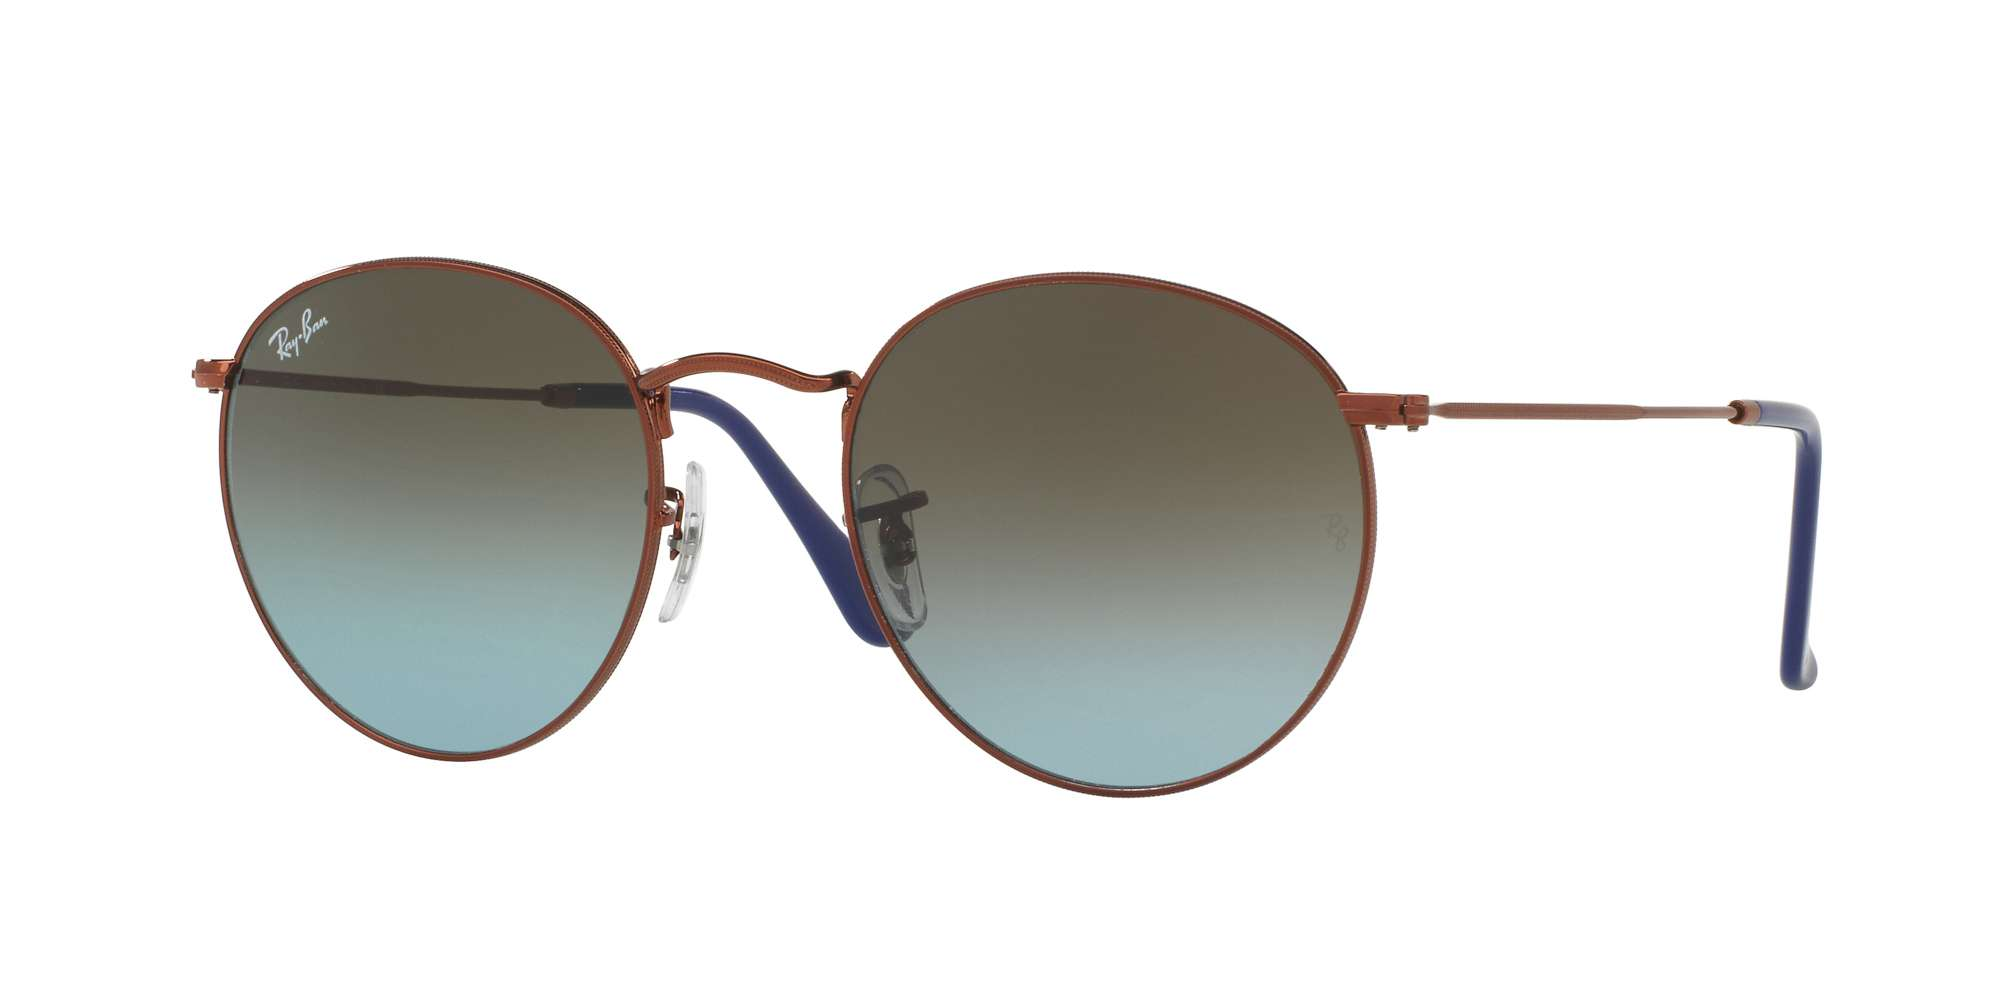 SHINY DARK BRONZE / BLUE GRADIENT BROWN lenses